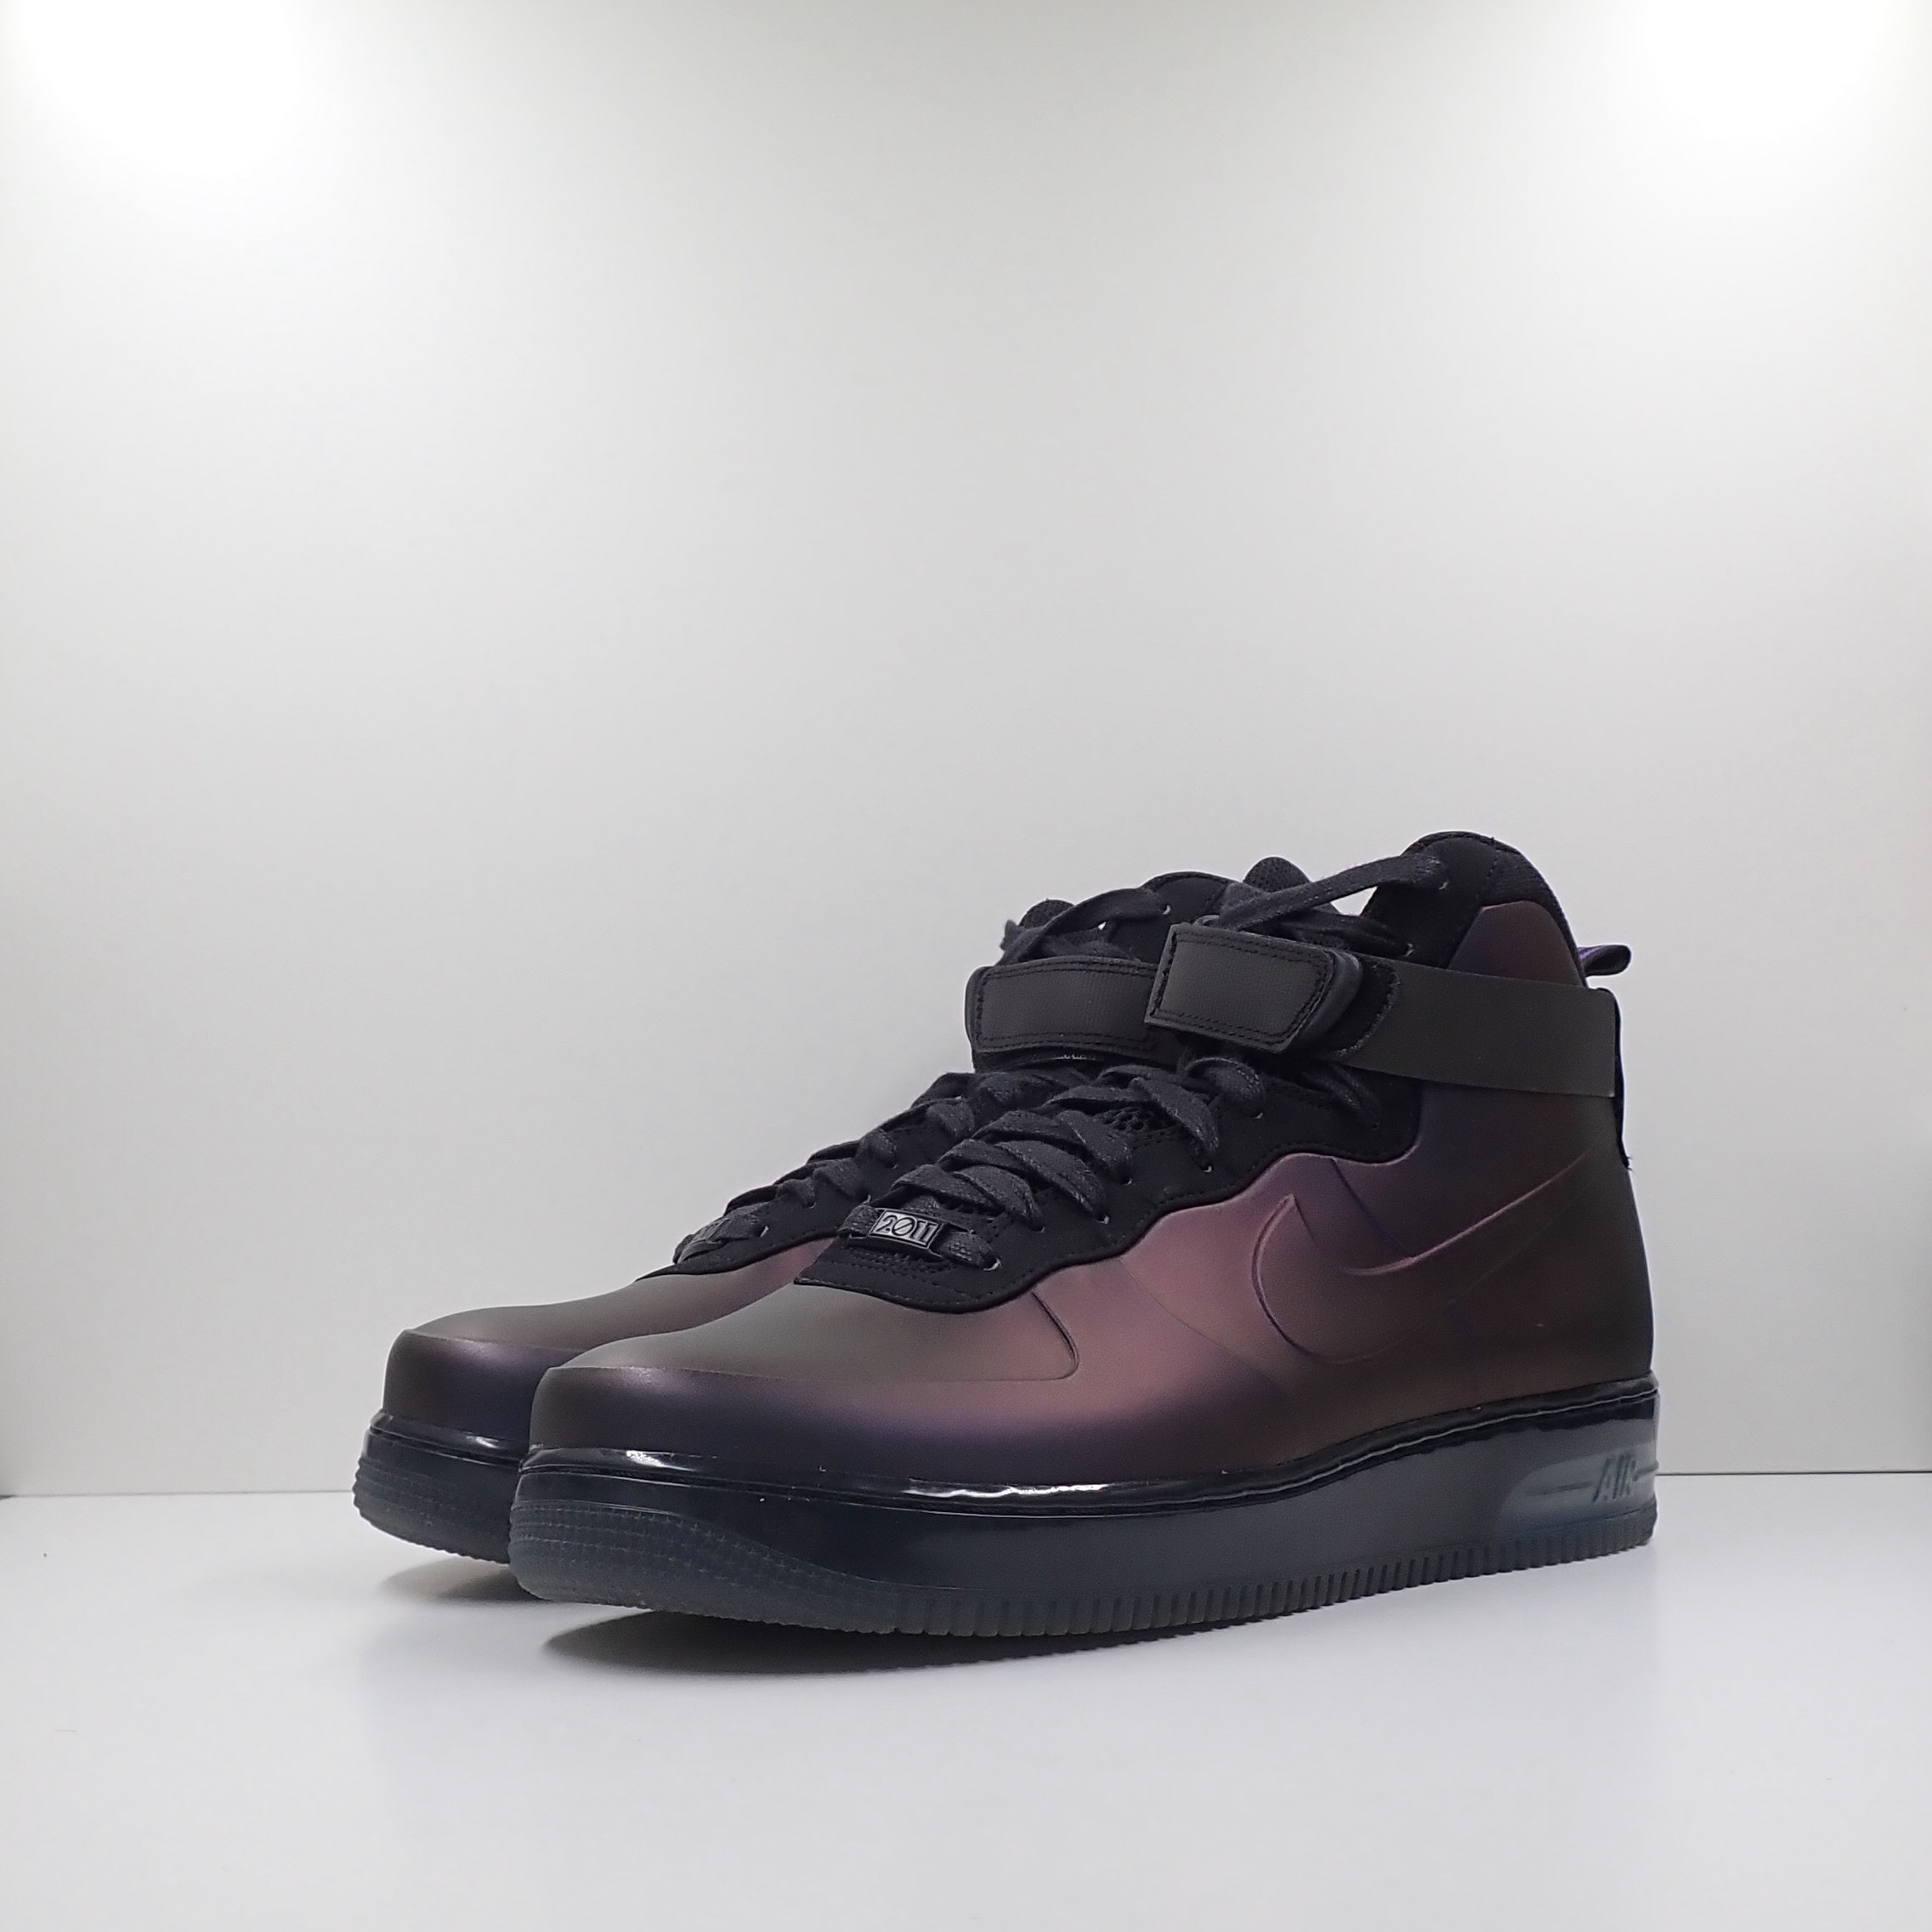 Nike Air Force 1 Foamposite 'Kobe'